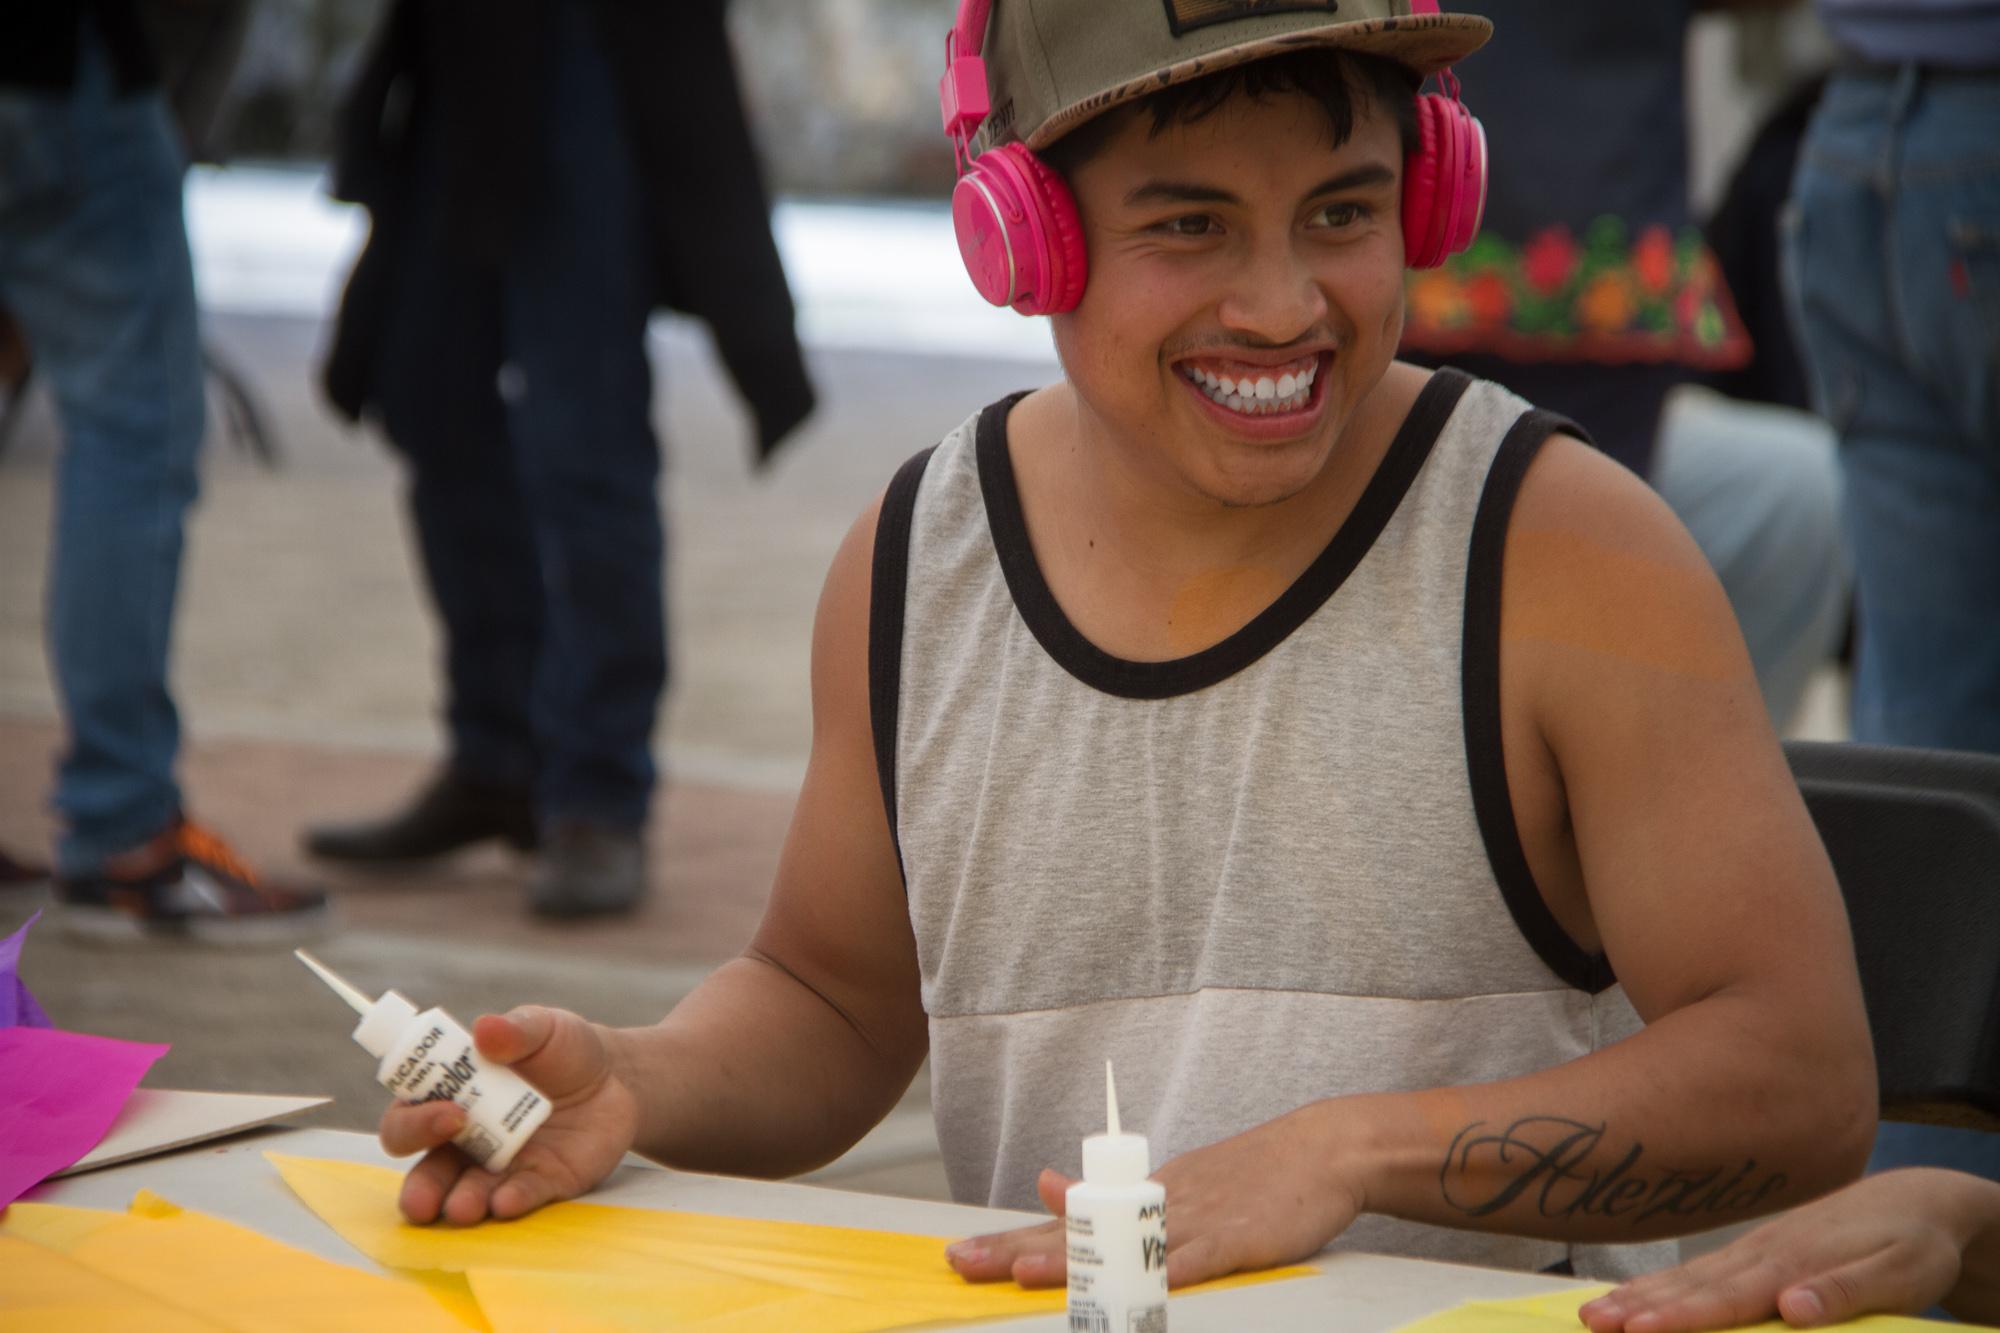 Beats by AnDREs   CantoyaFest: Pátzcuaro, Michoacán, Mexico — Friday, July 21, 2017